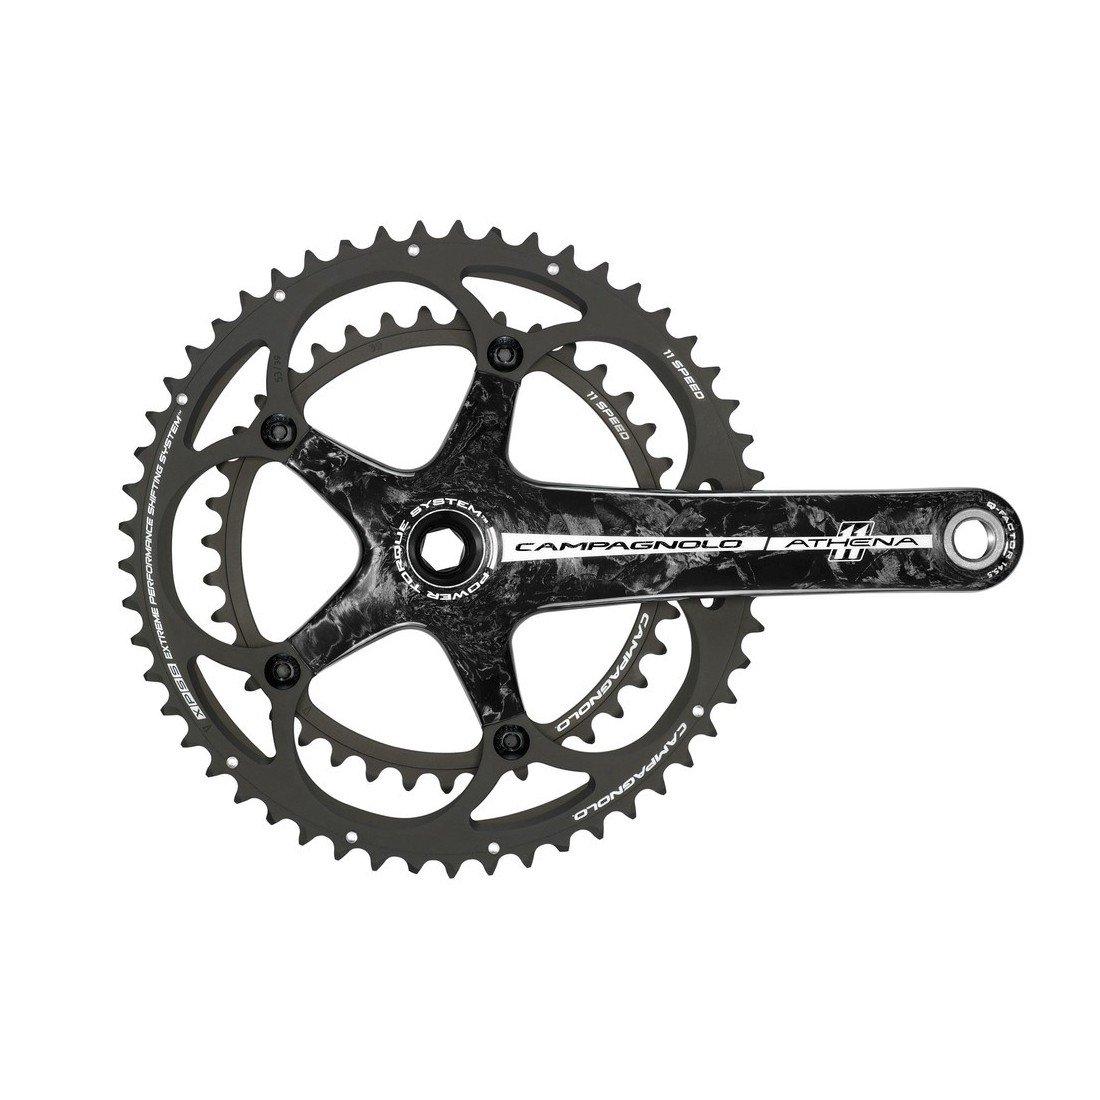 campagnolo(フリガナ: カンパニョーロ) 自転車 ロードバイク 部品 アテナ カーボンクランクセット 170/52/39 18-FC11AT092C B00DHGWXTK